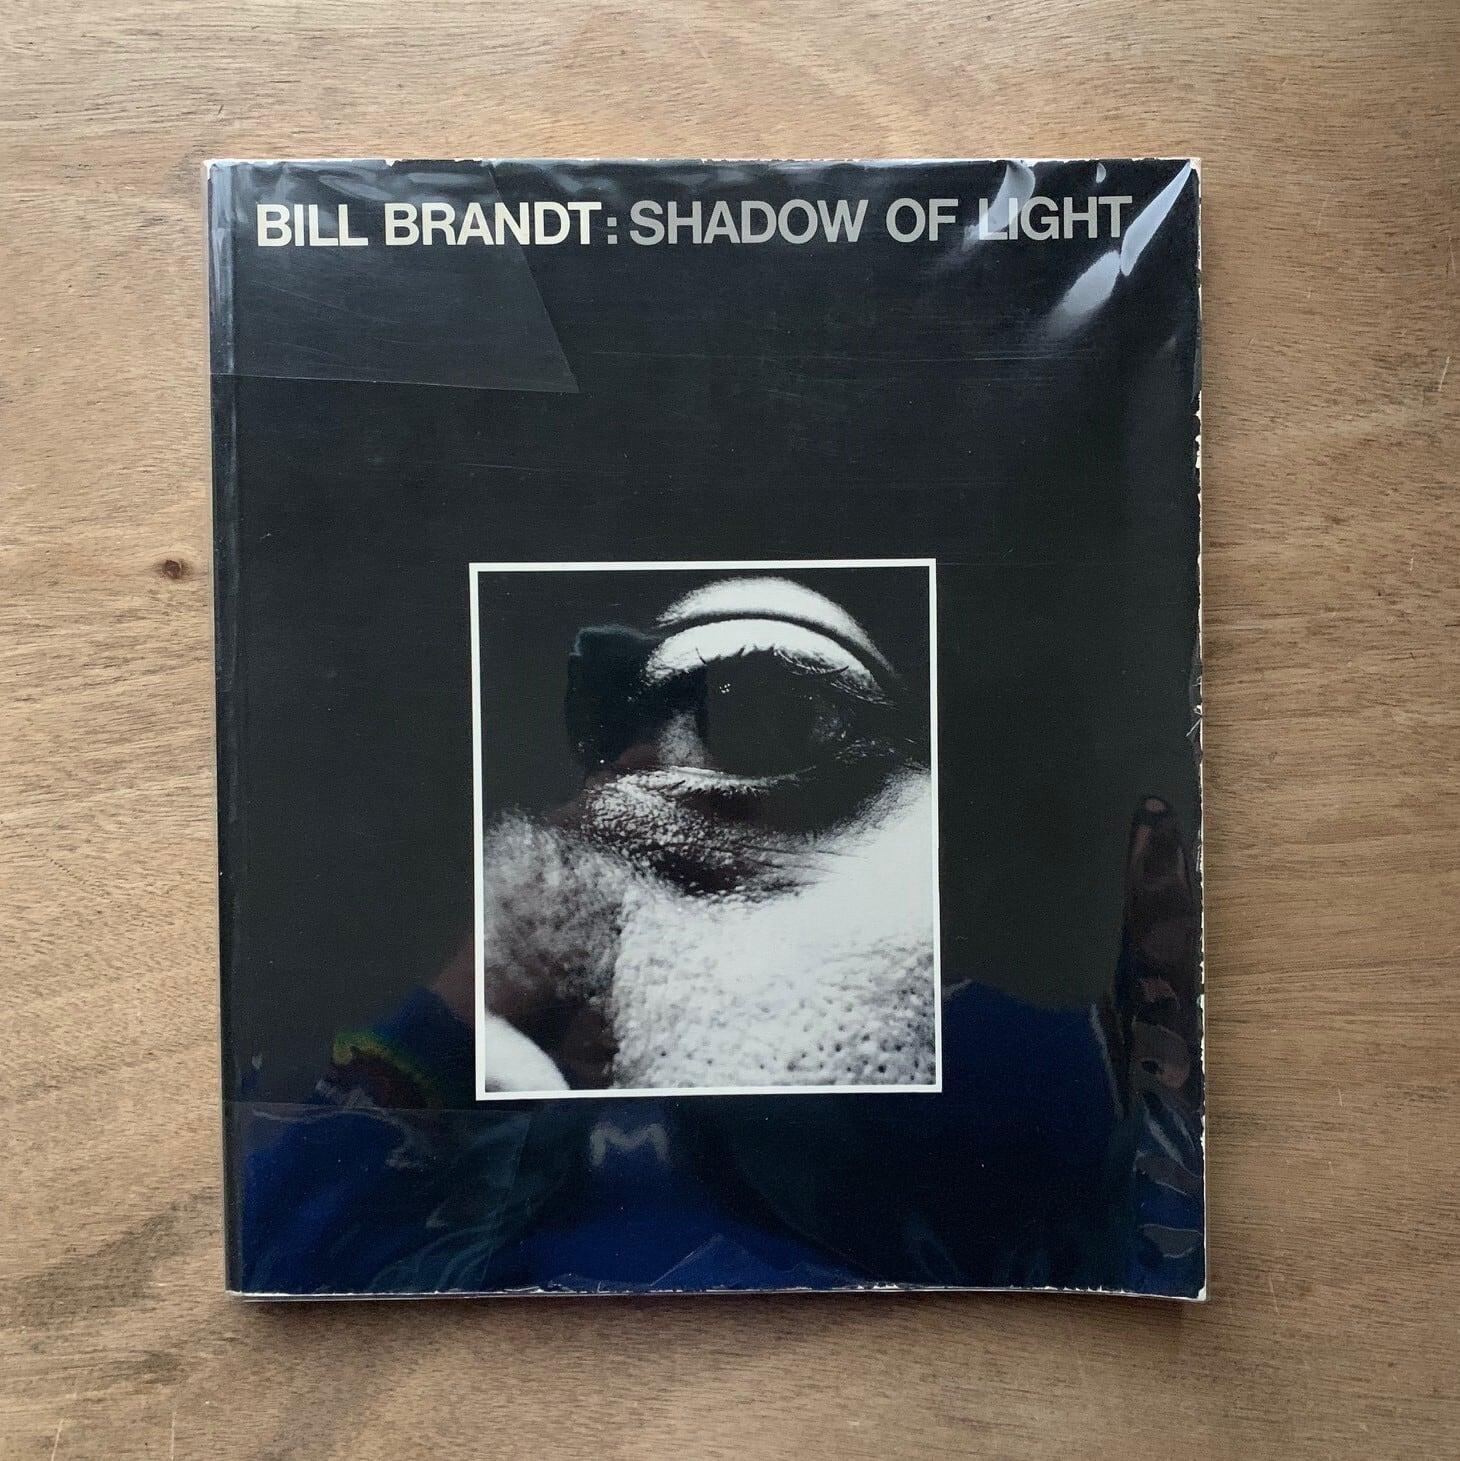 Shadow of Light シャドー・オブ・ライト / Brandt, Bill ビル・ブラント